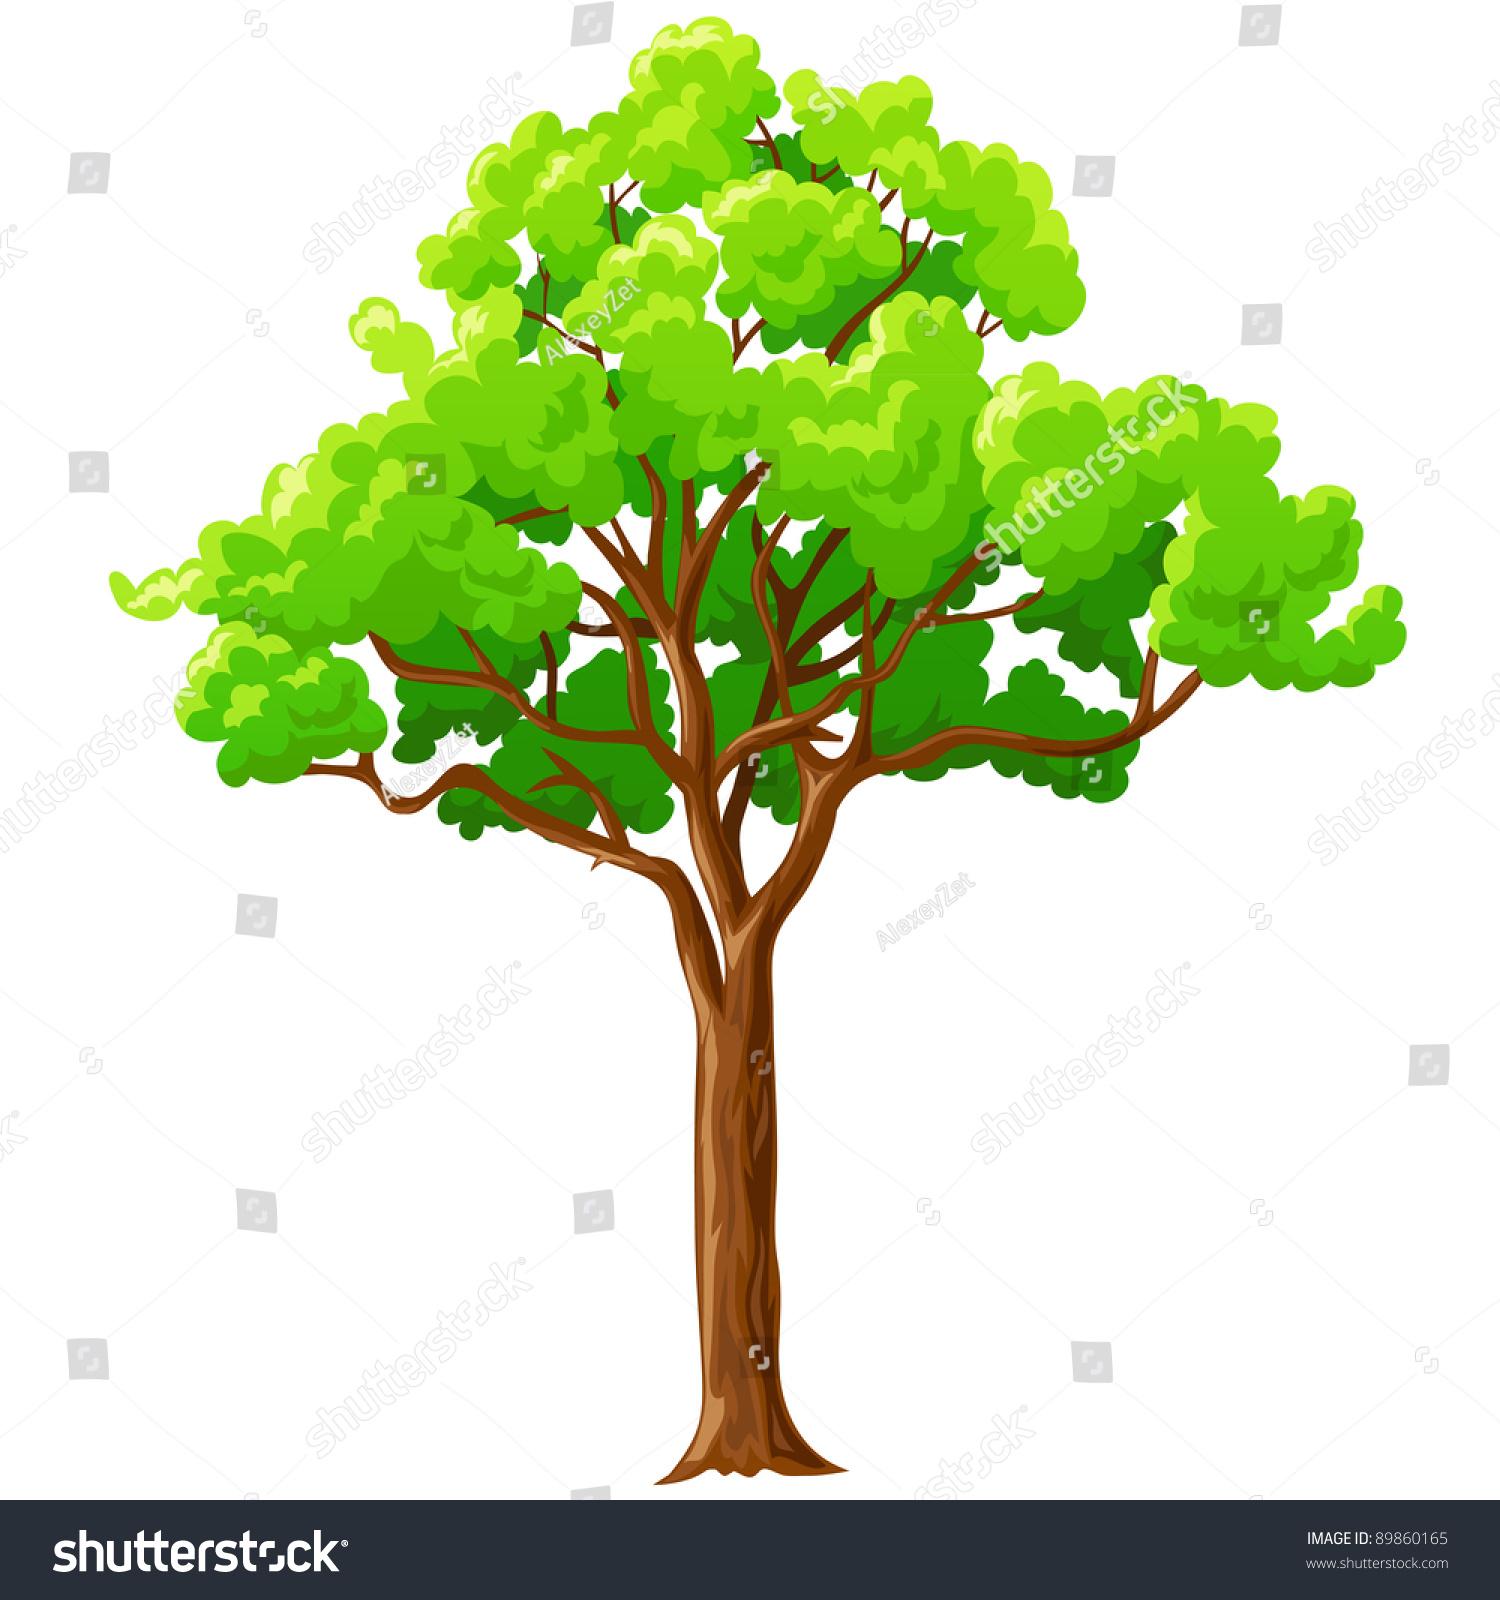 Cartoon Big Green Tree Branches Isolated Stock Vector Royalty Free 89860165 Download tree cartoon branch stock vectors. https www shutterstock com image vector cartoon big green tree branches isolated 89860165